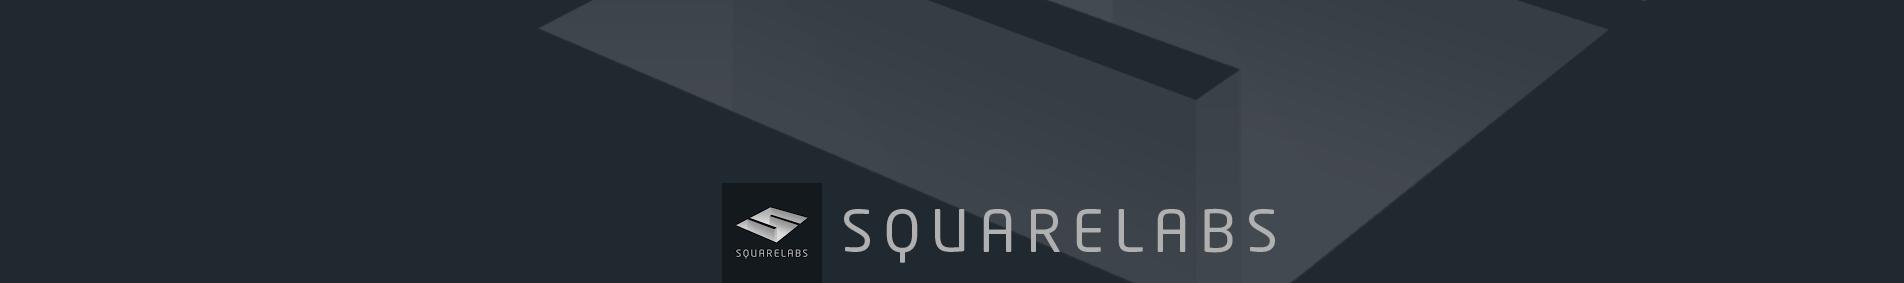 squarelabs